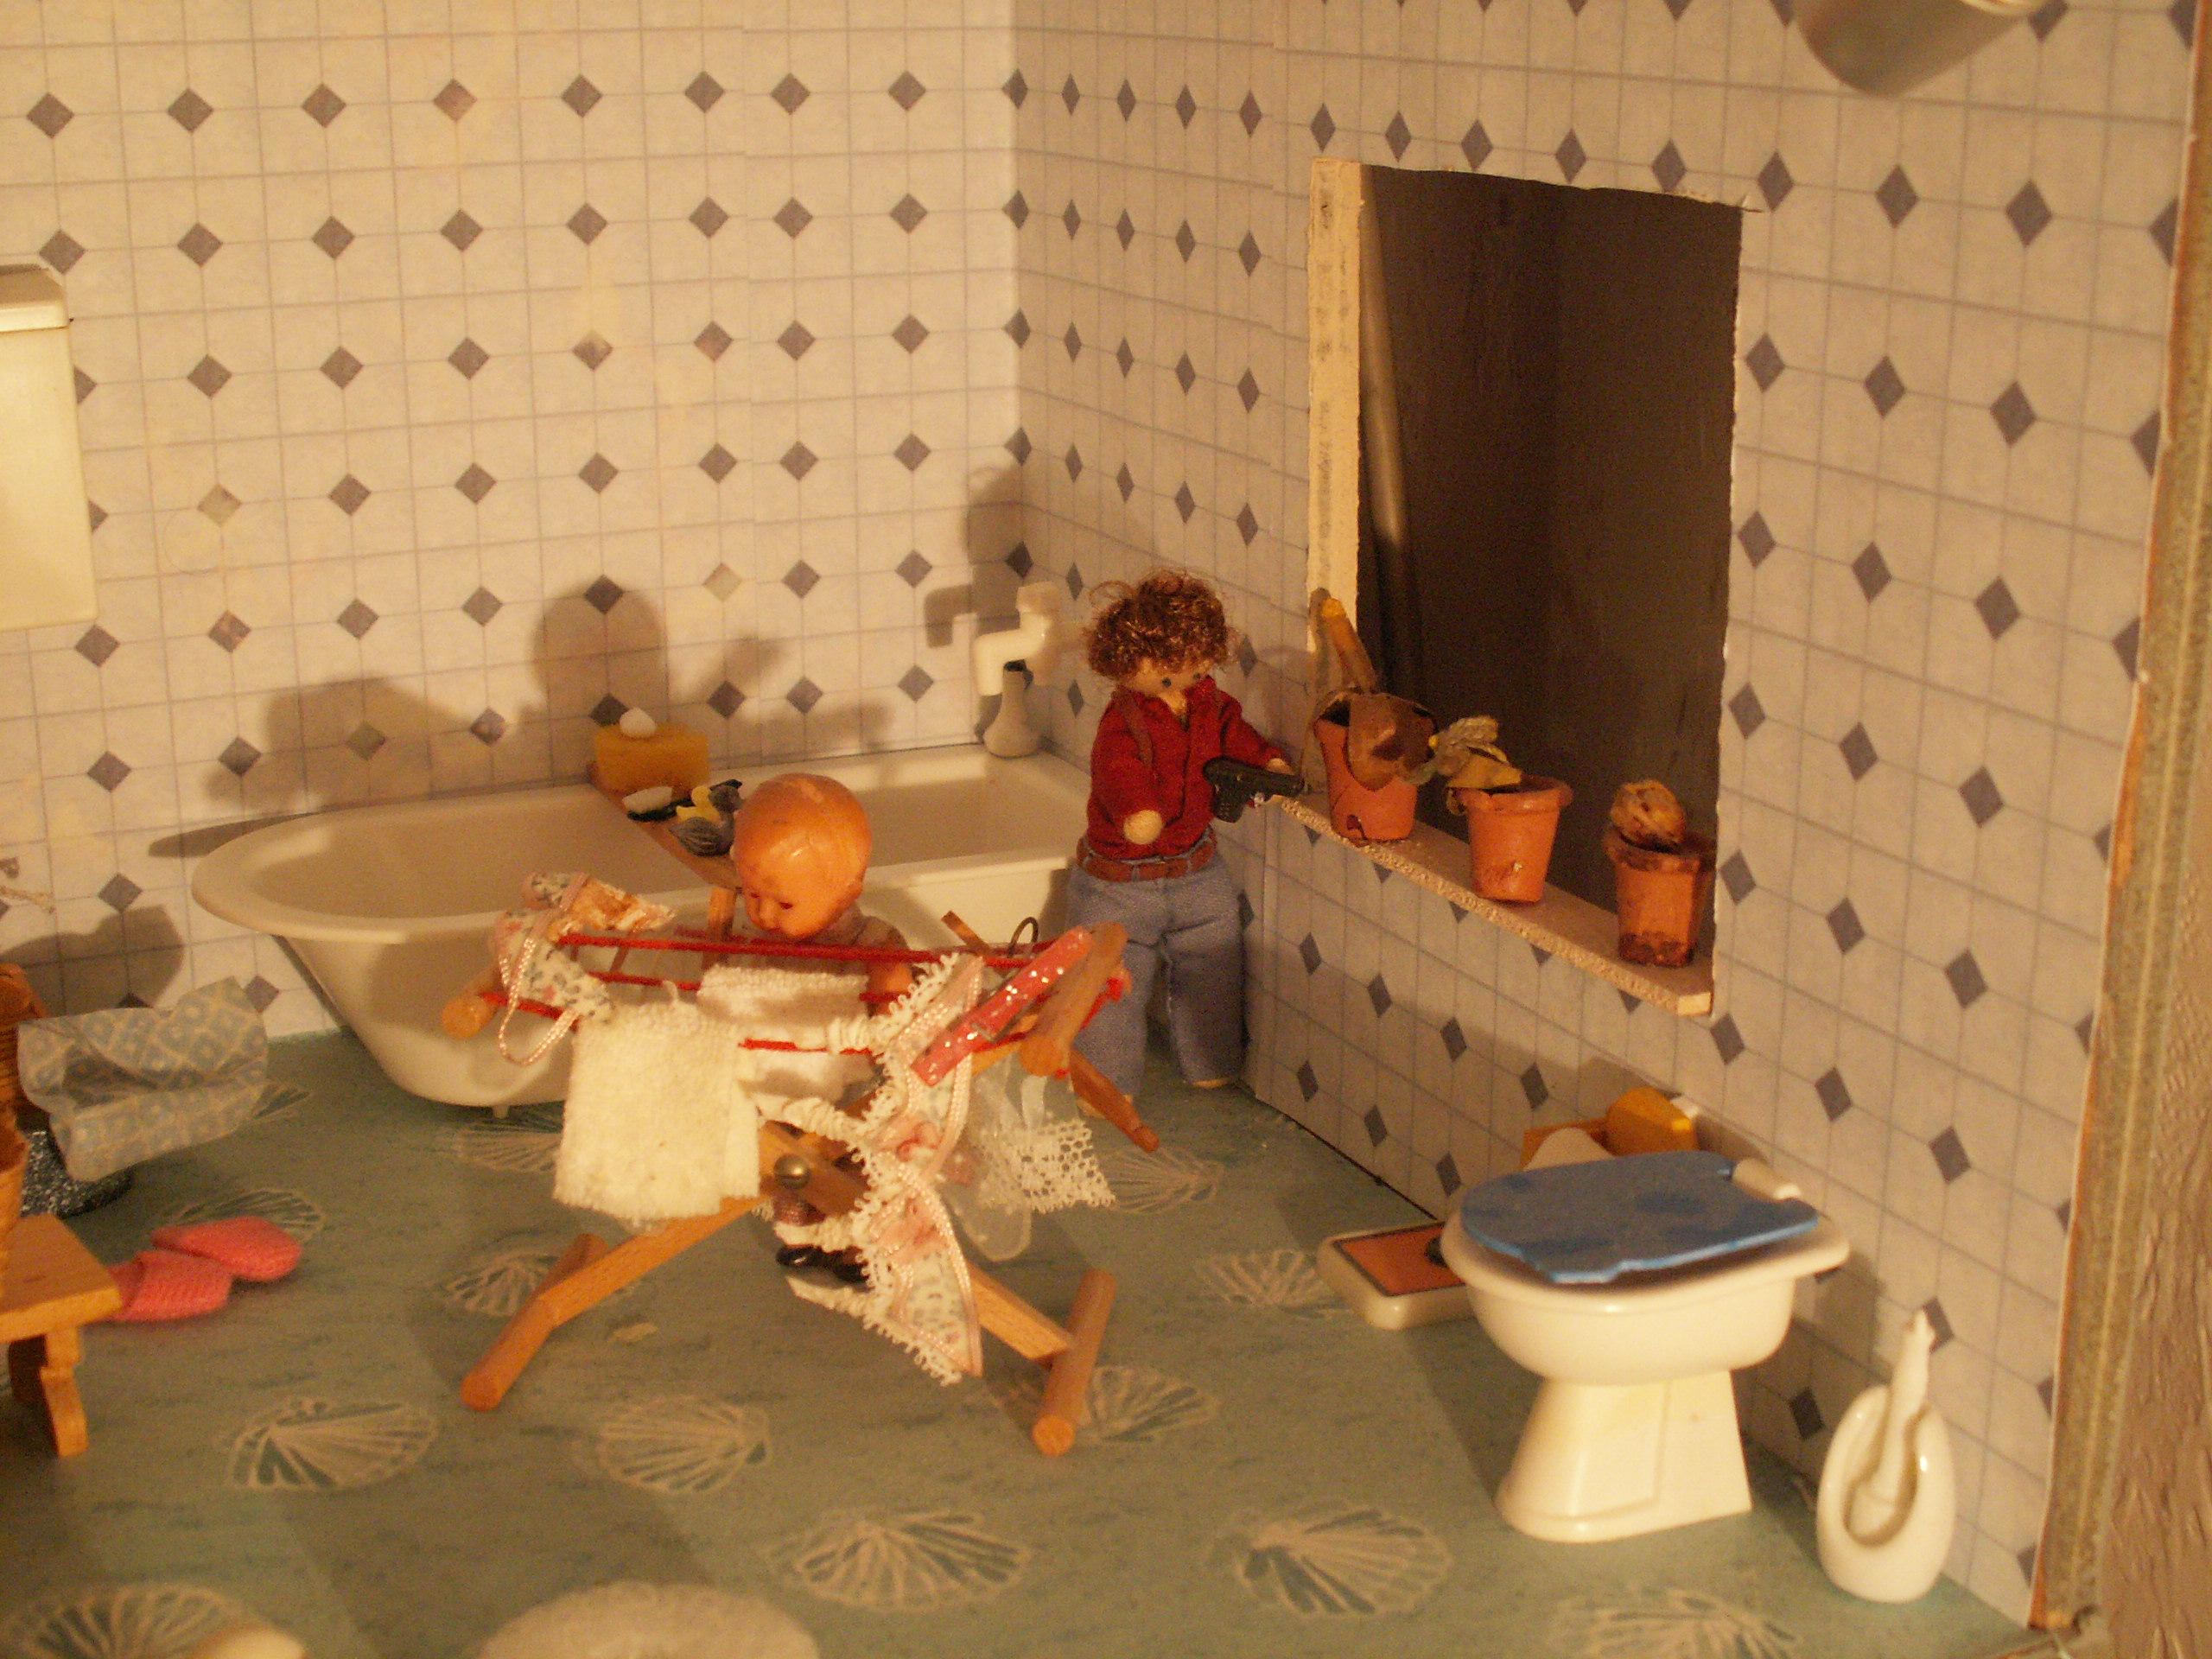 Bathroom with granny